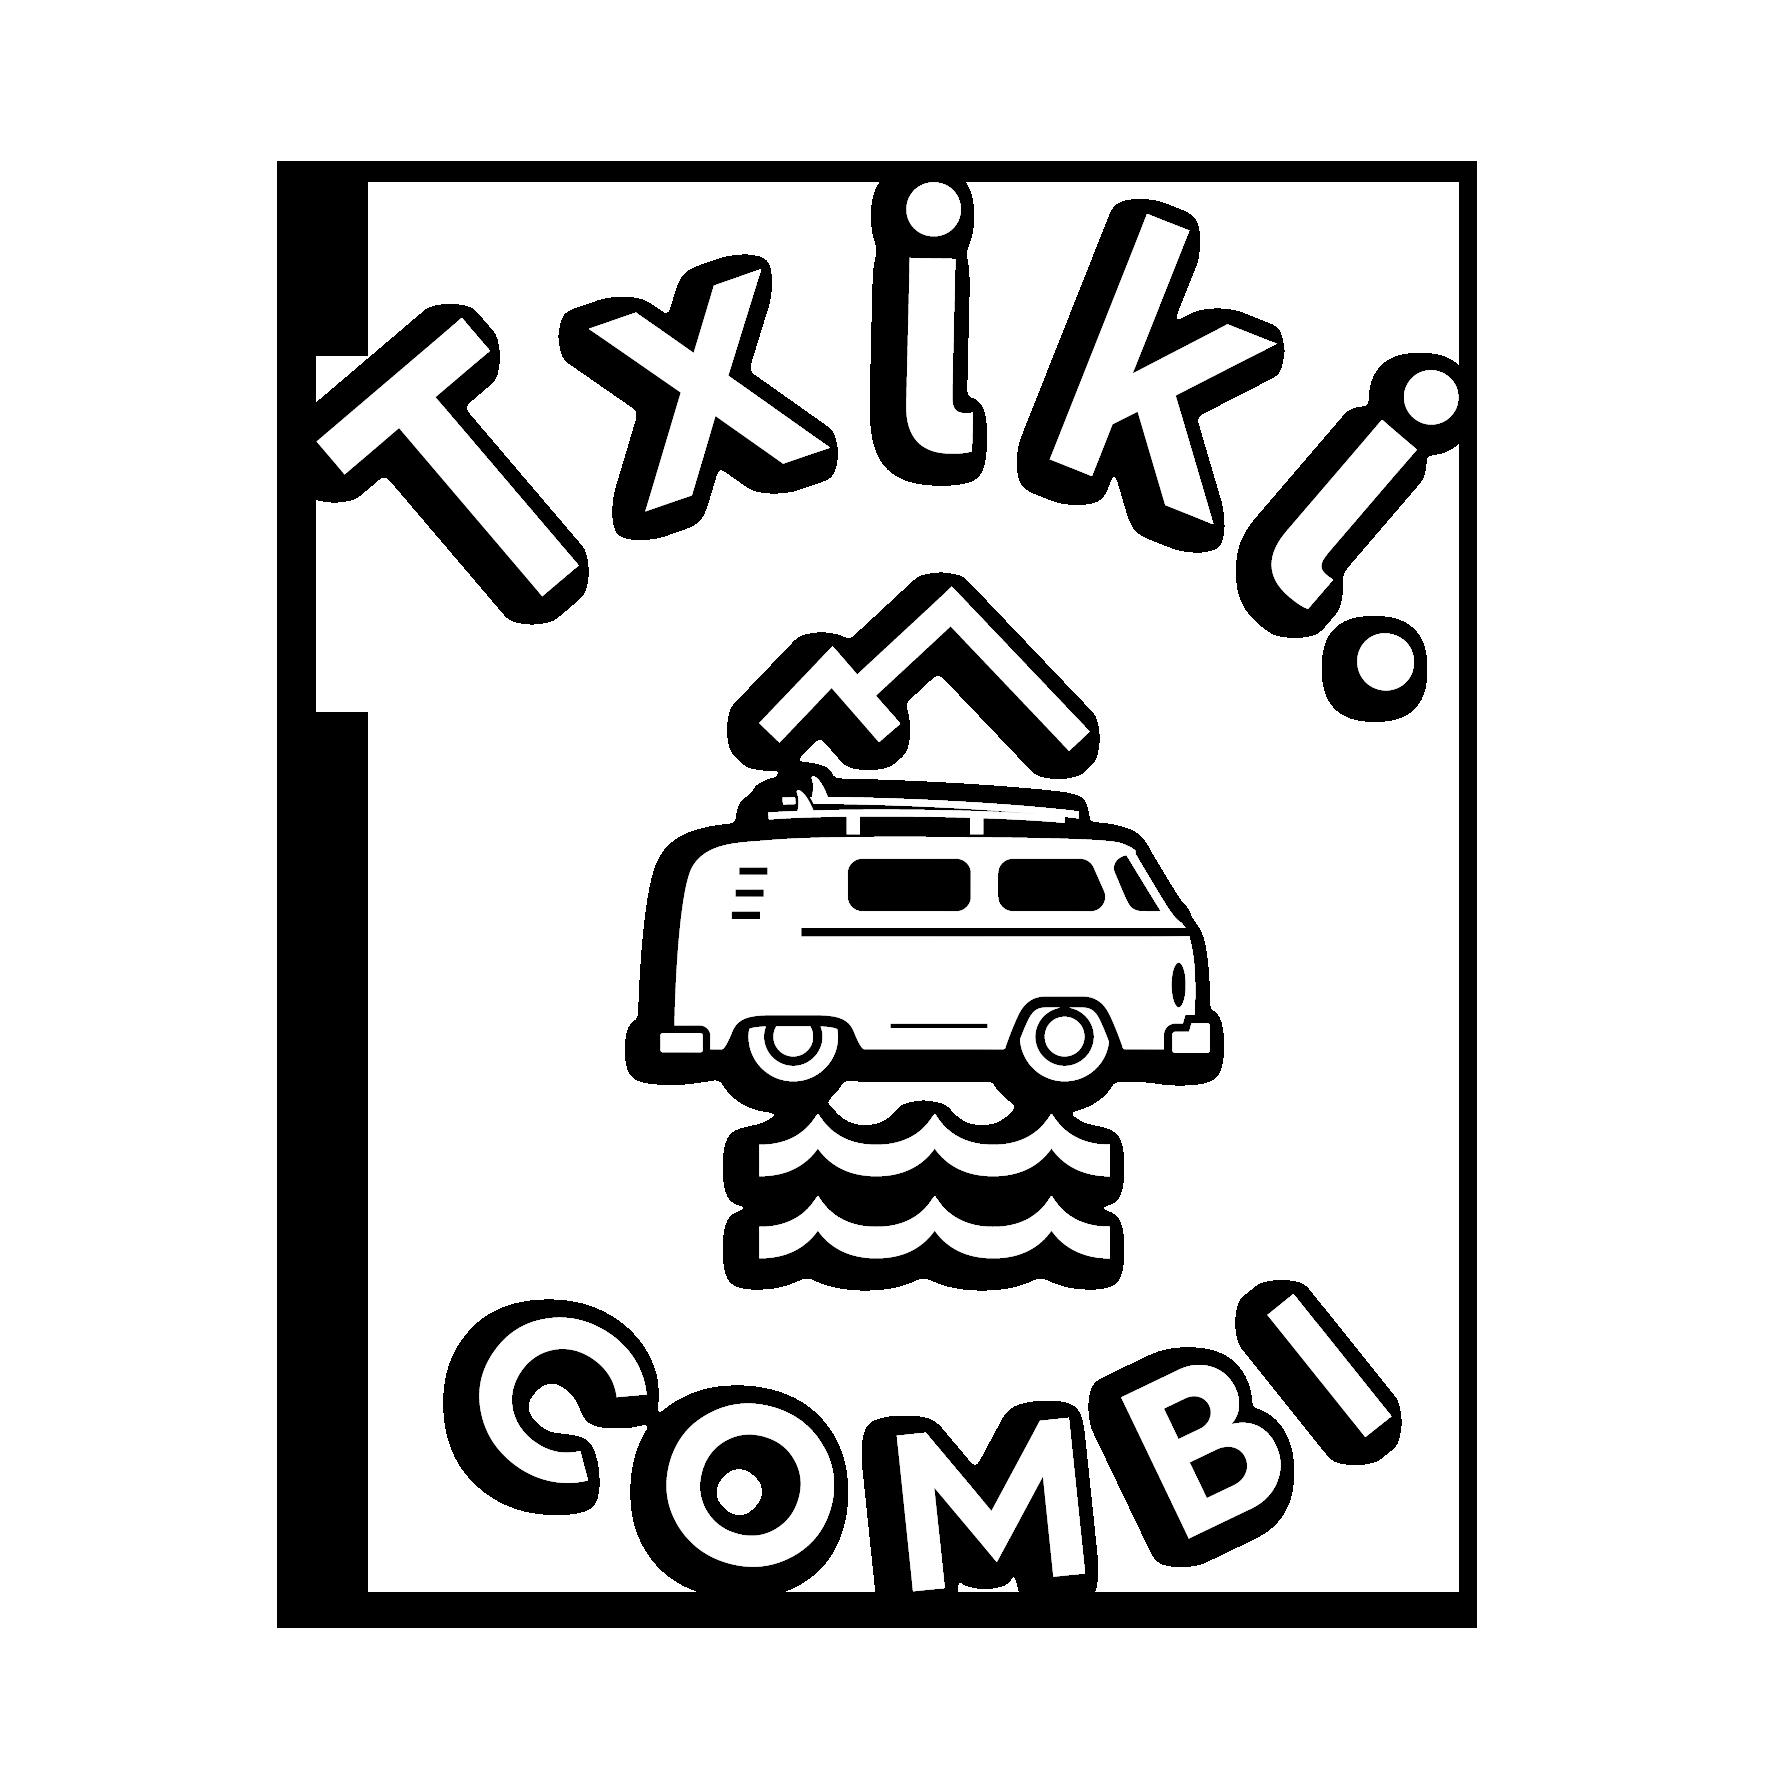 Txiki combi | Visite Pays Basque Insolite - Logo